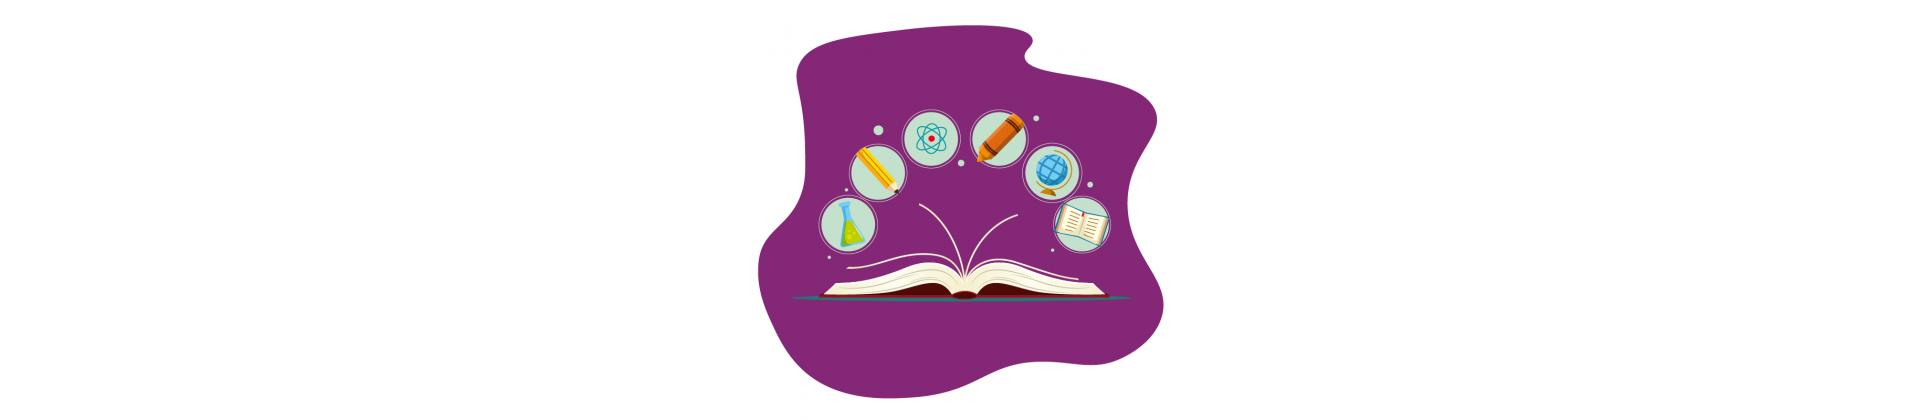 Livres d'apprentissage